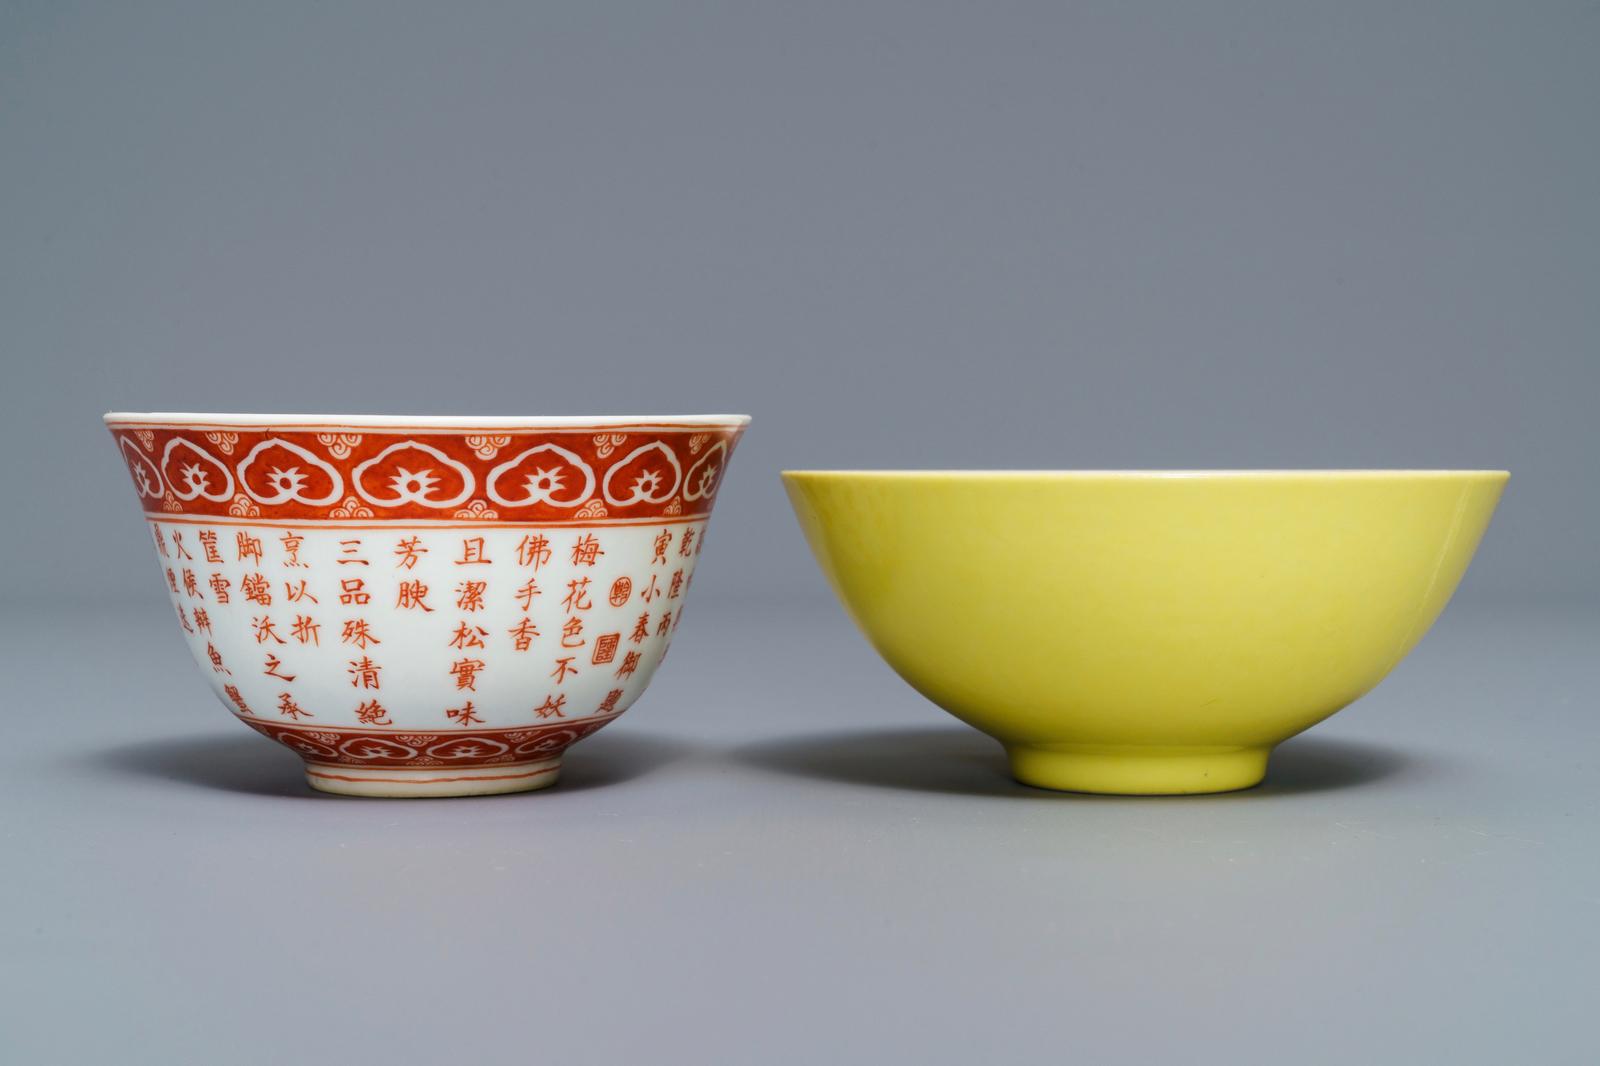 Lot 20 - A Chinese monochrome yellow bowl and an iron-red poem bowl, Yongzheng & Qianlong mark, 19/20th C.